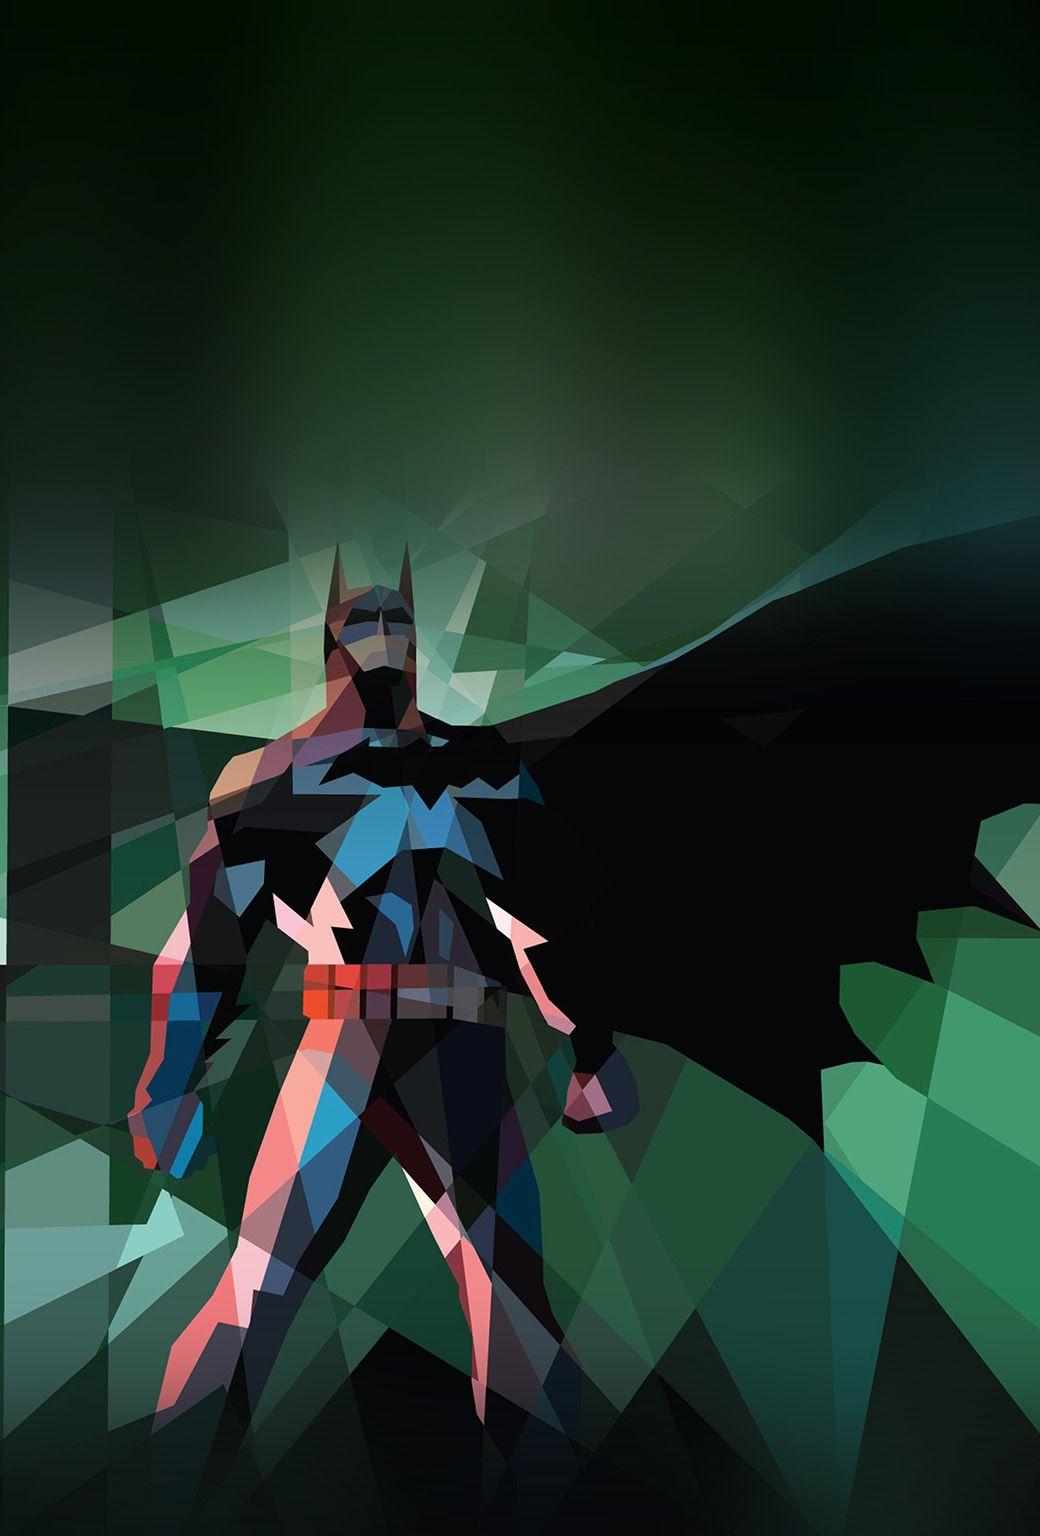 s5 wallpaper batman Buscar con Google Superheroes